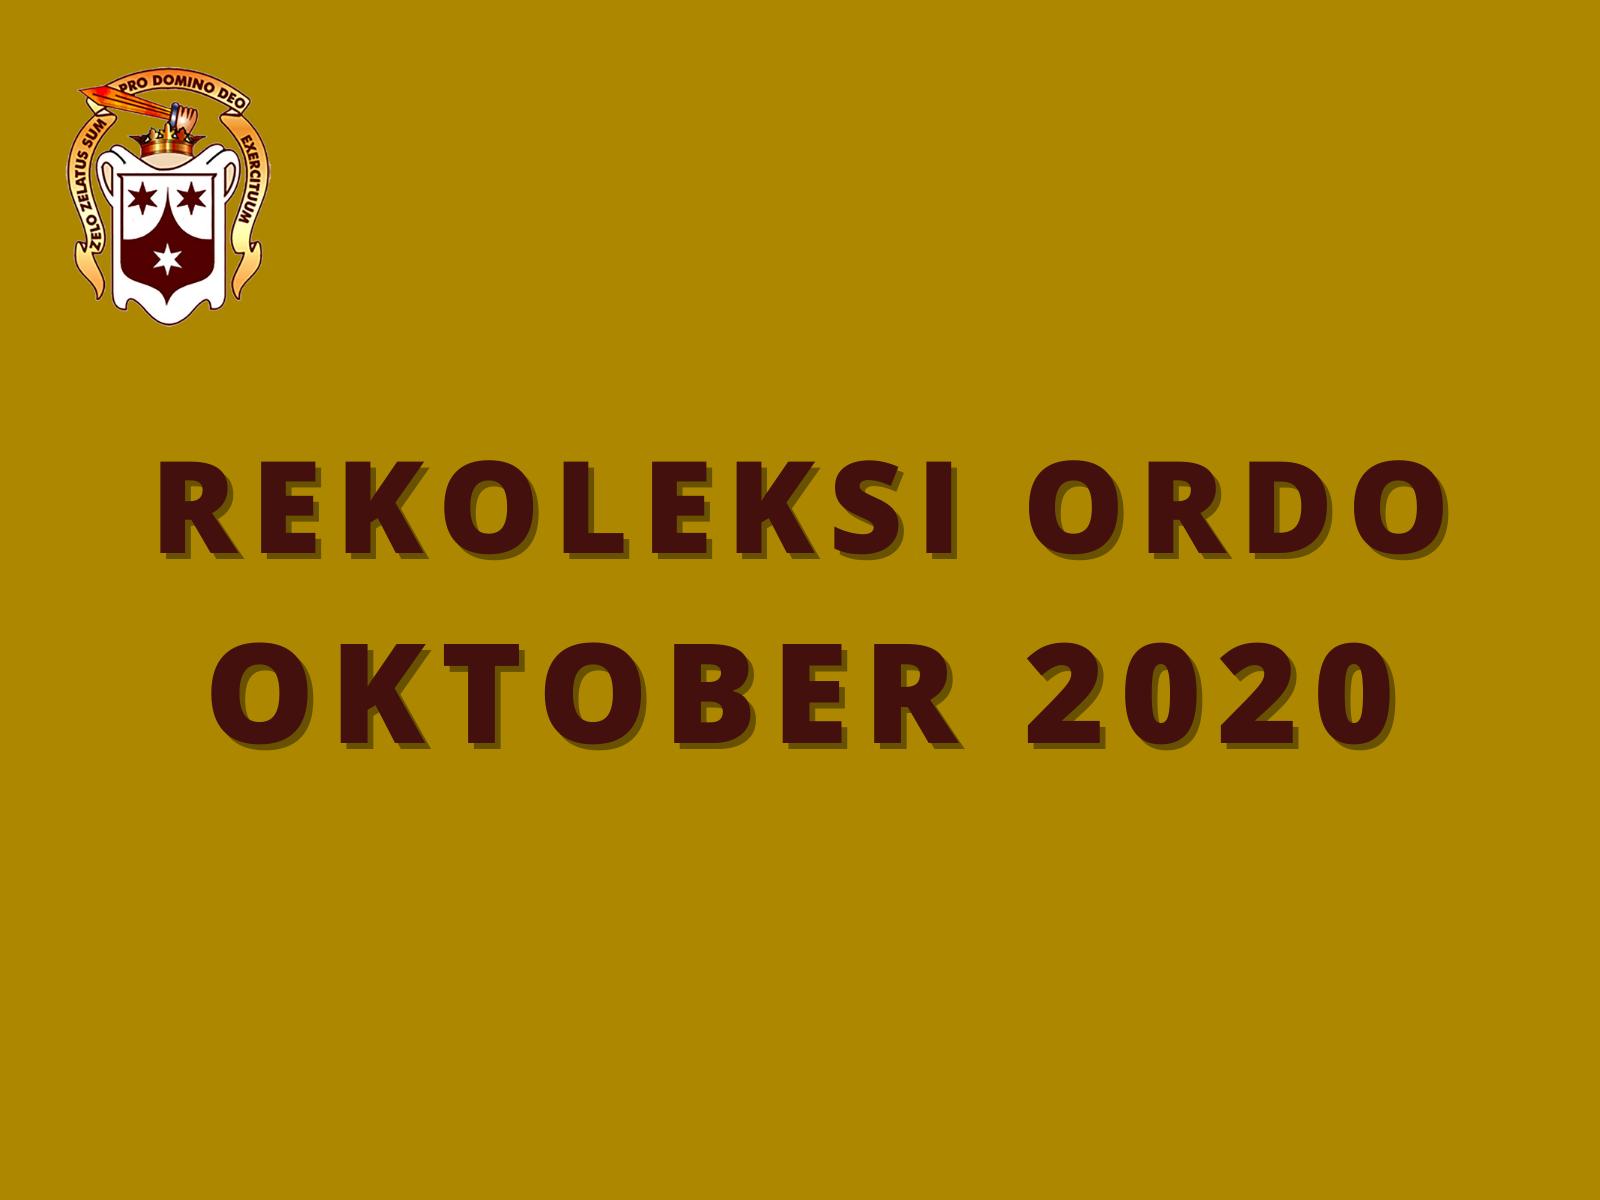 Rekoleksi Ordo – Oktober 2020